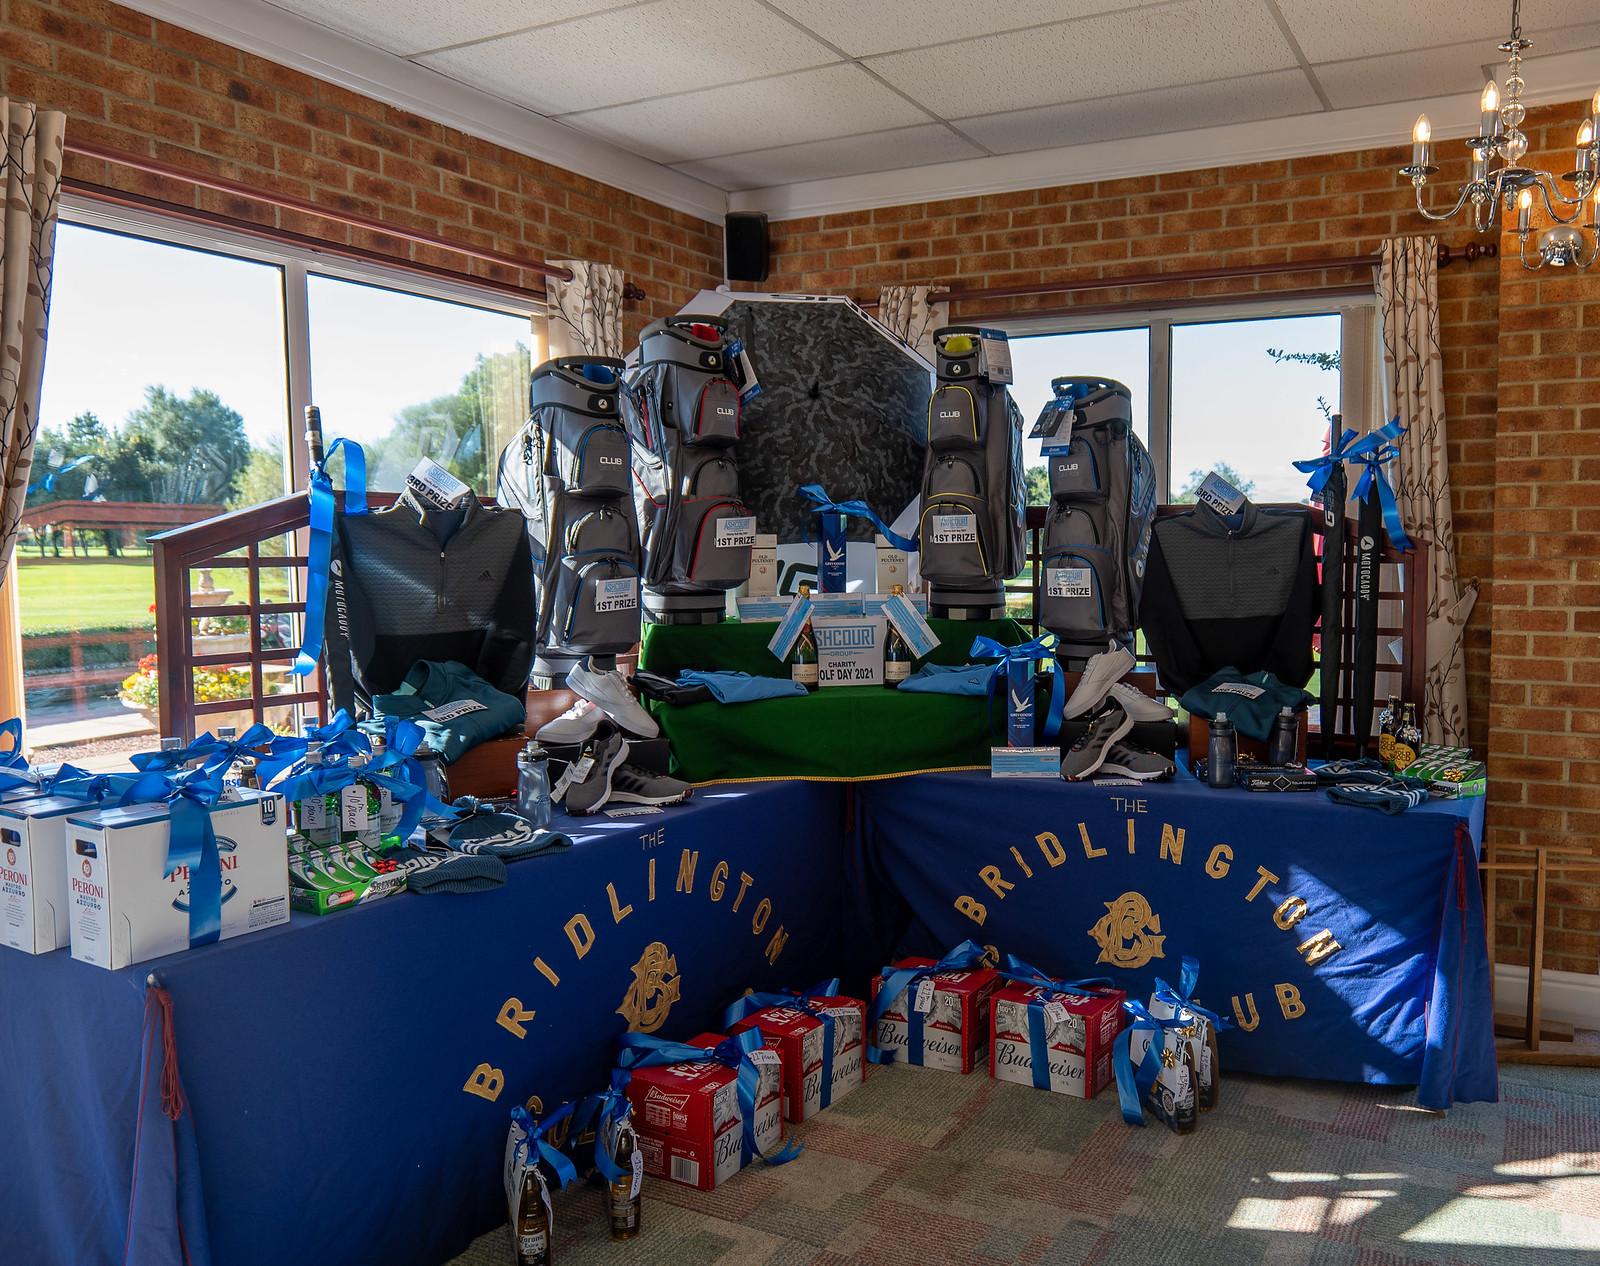 Ashcourt Golf Day - Bridlington Belvedere